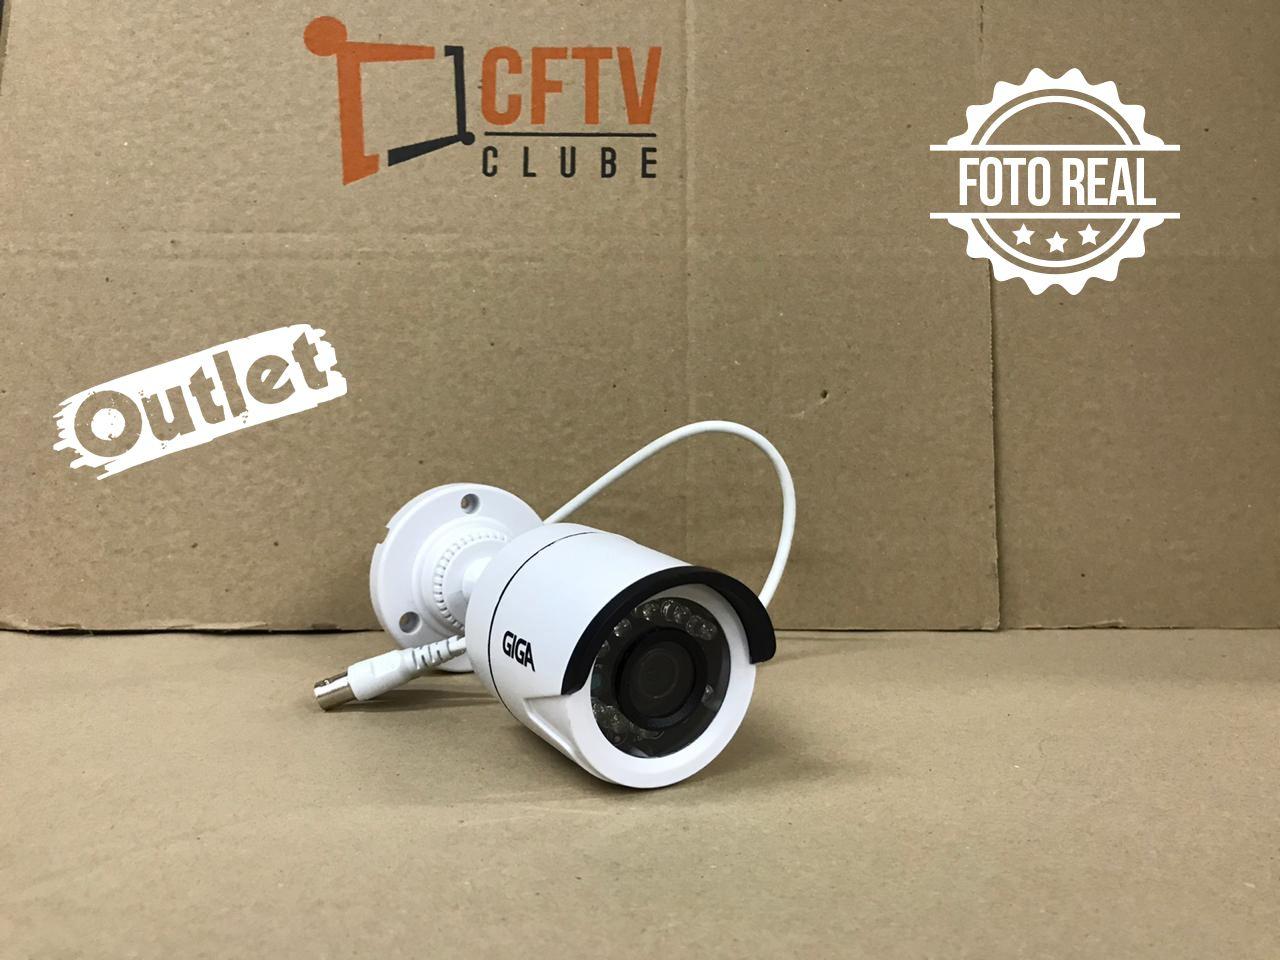 Outlet - Câmera Giga GS0014 Bullet Open HD Plus IR 20M UTC DWDR (1.0MP | 720p | 2.6mm | Plast)  - CFTV Clube | Brasil